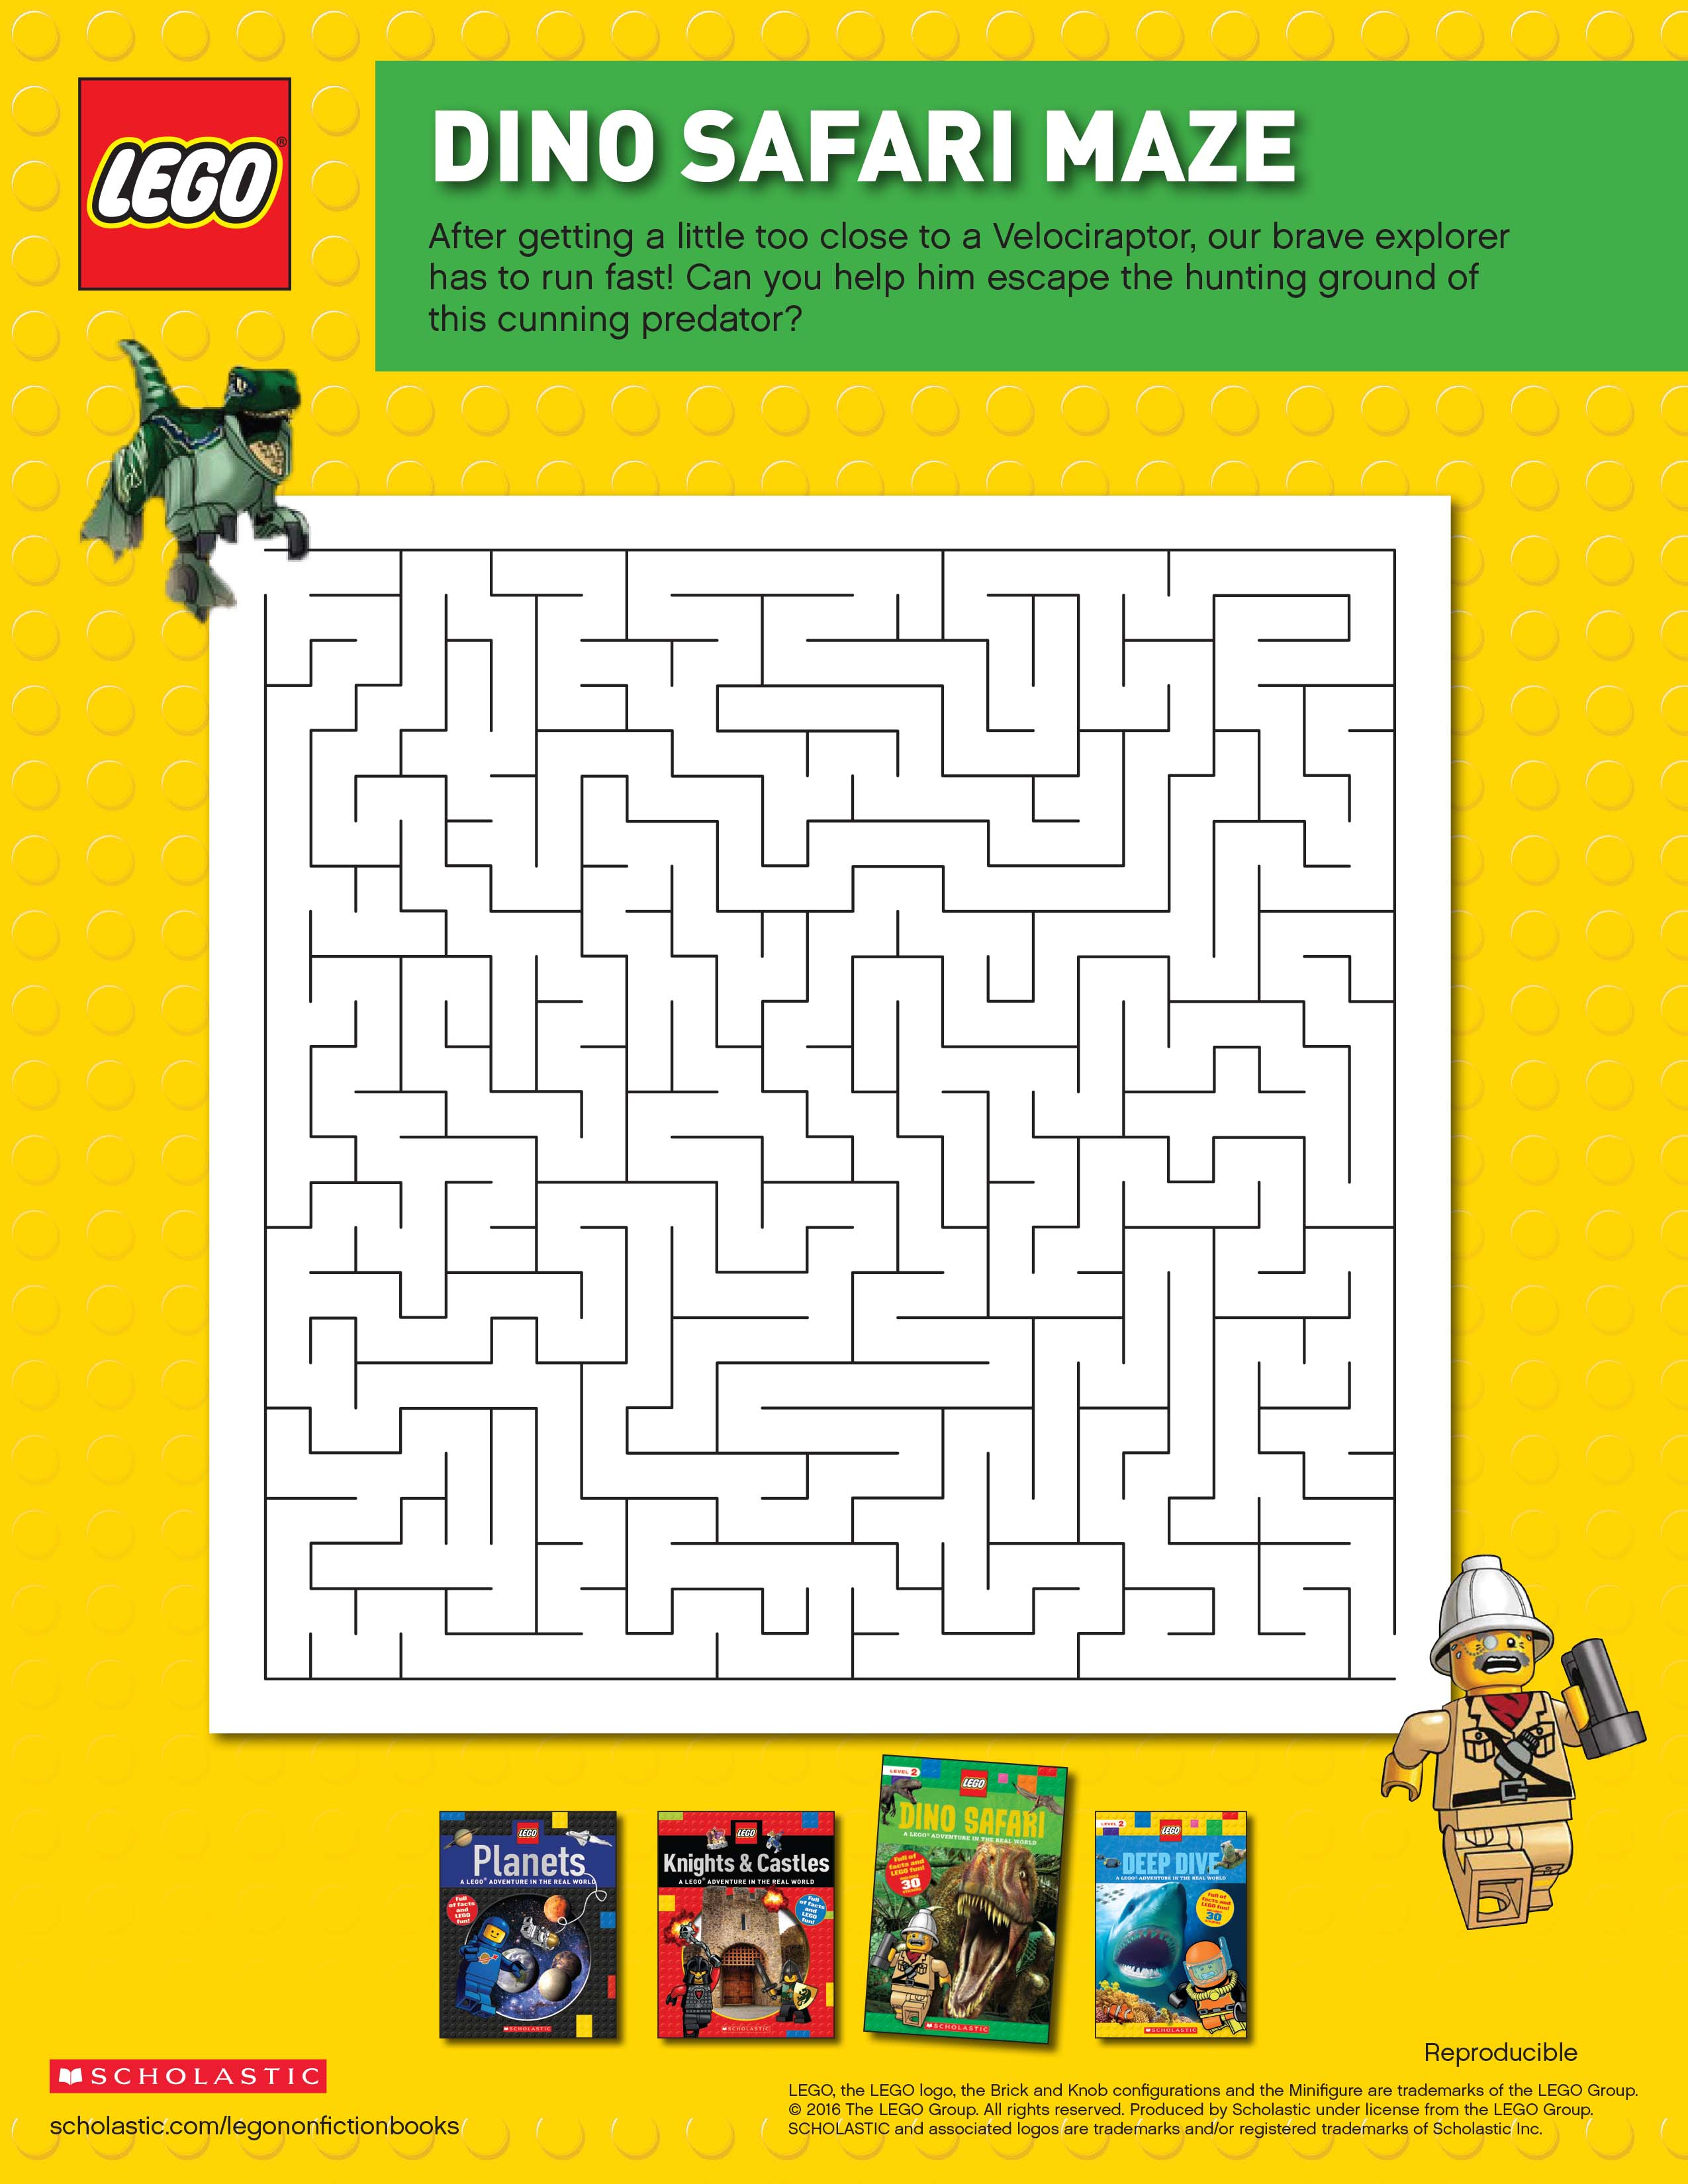 Lego Dino Safari Maze